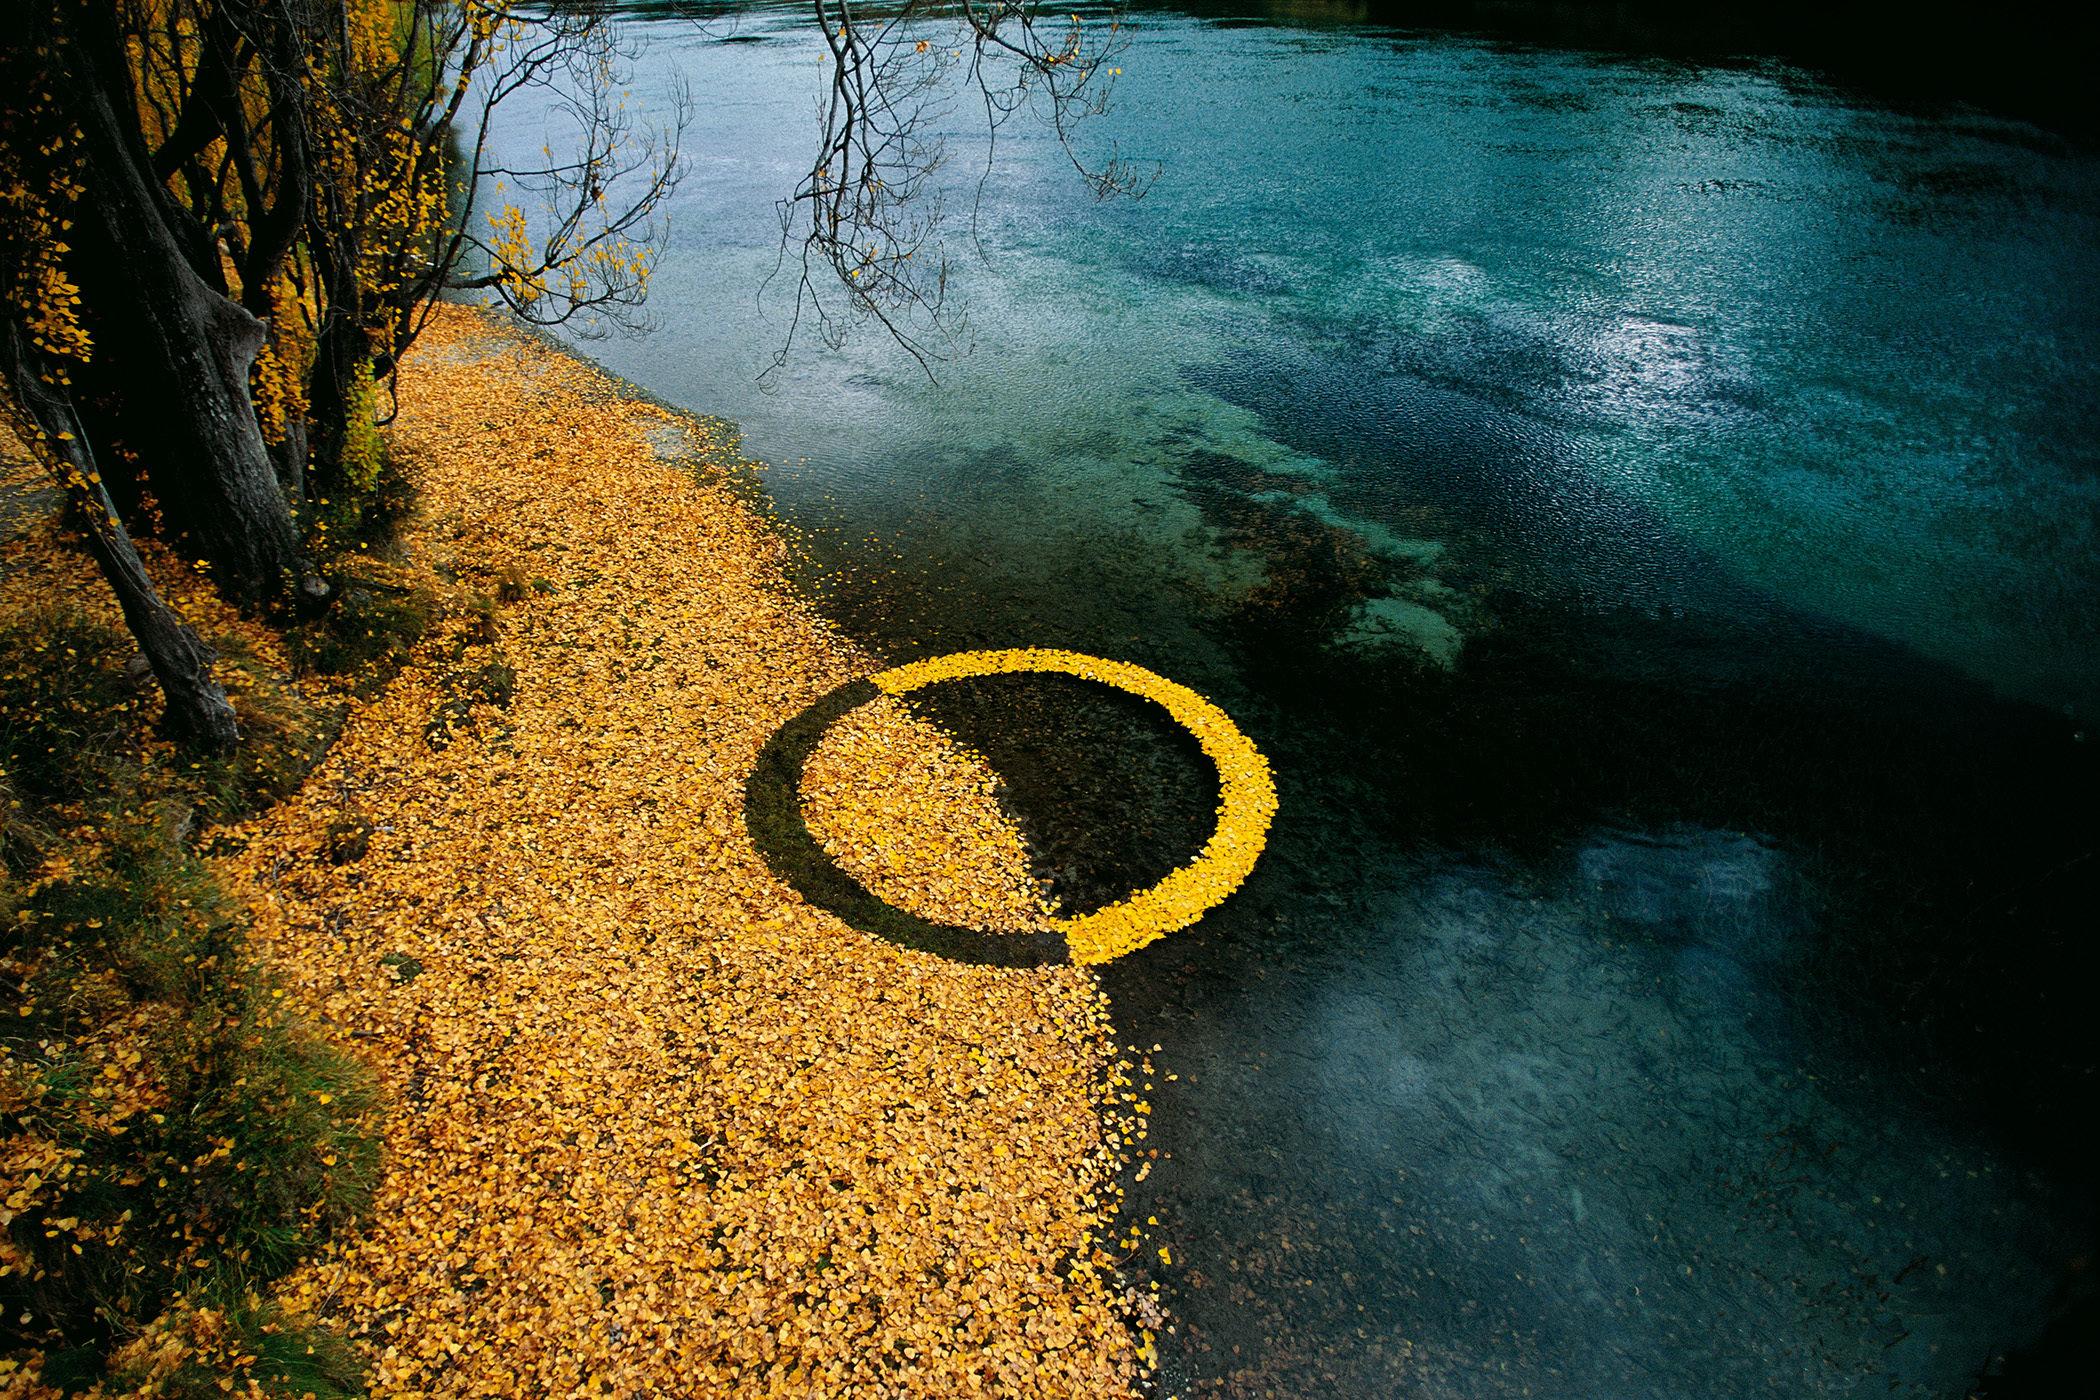 Autumn Leaf Circle 52